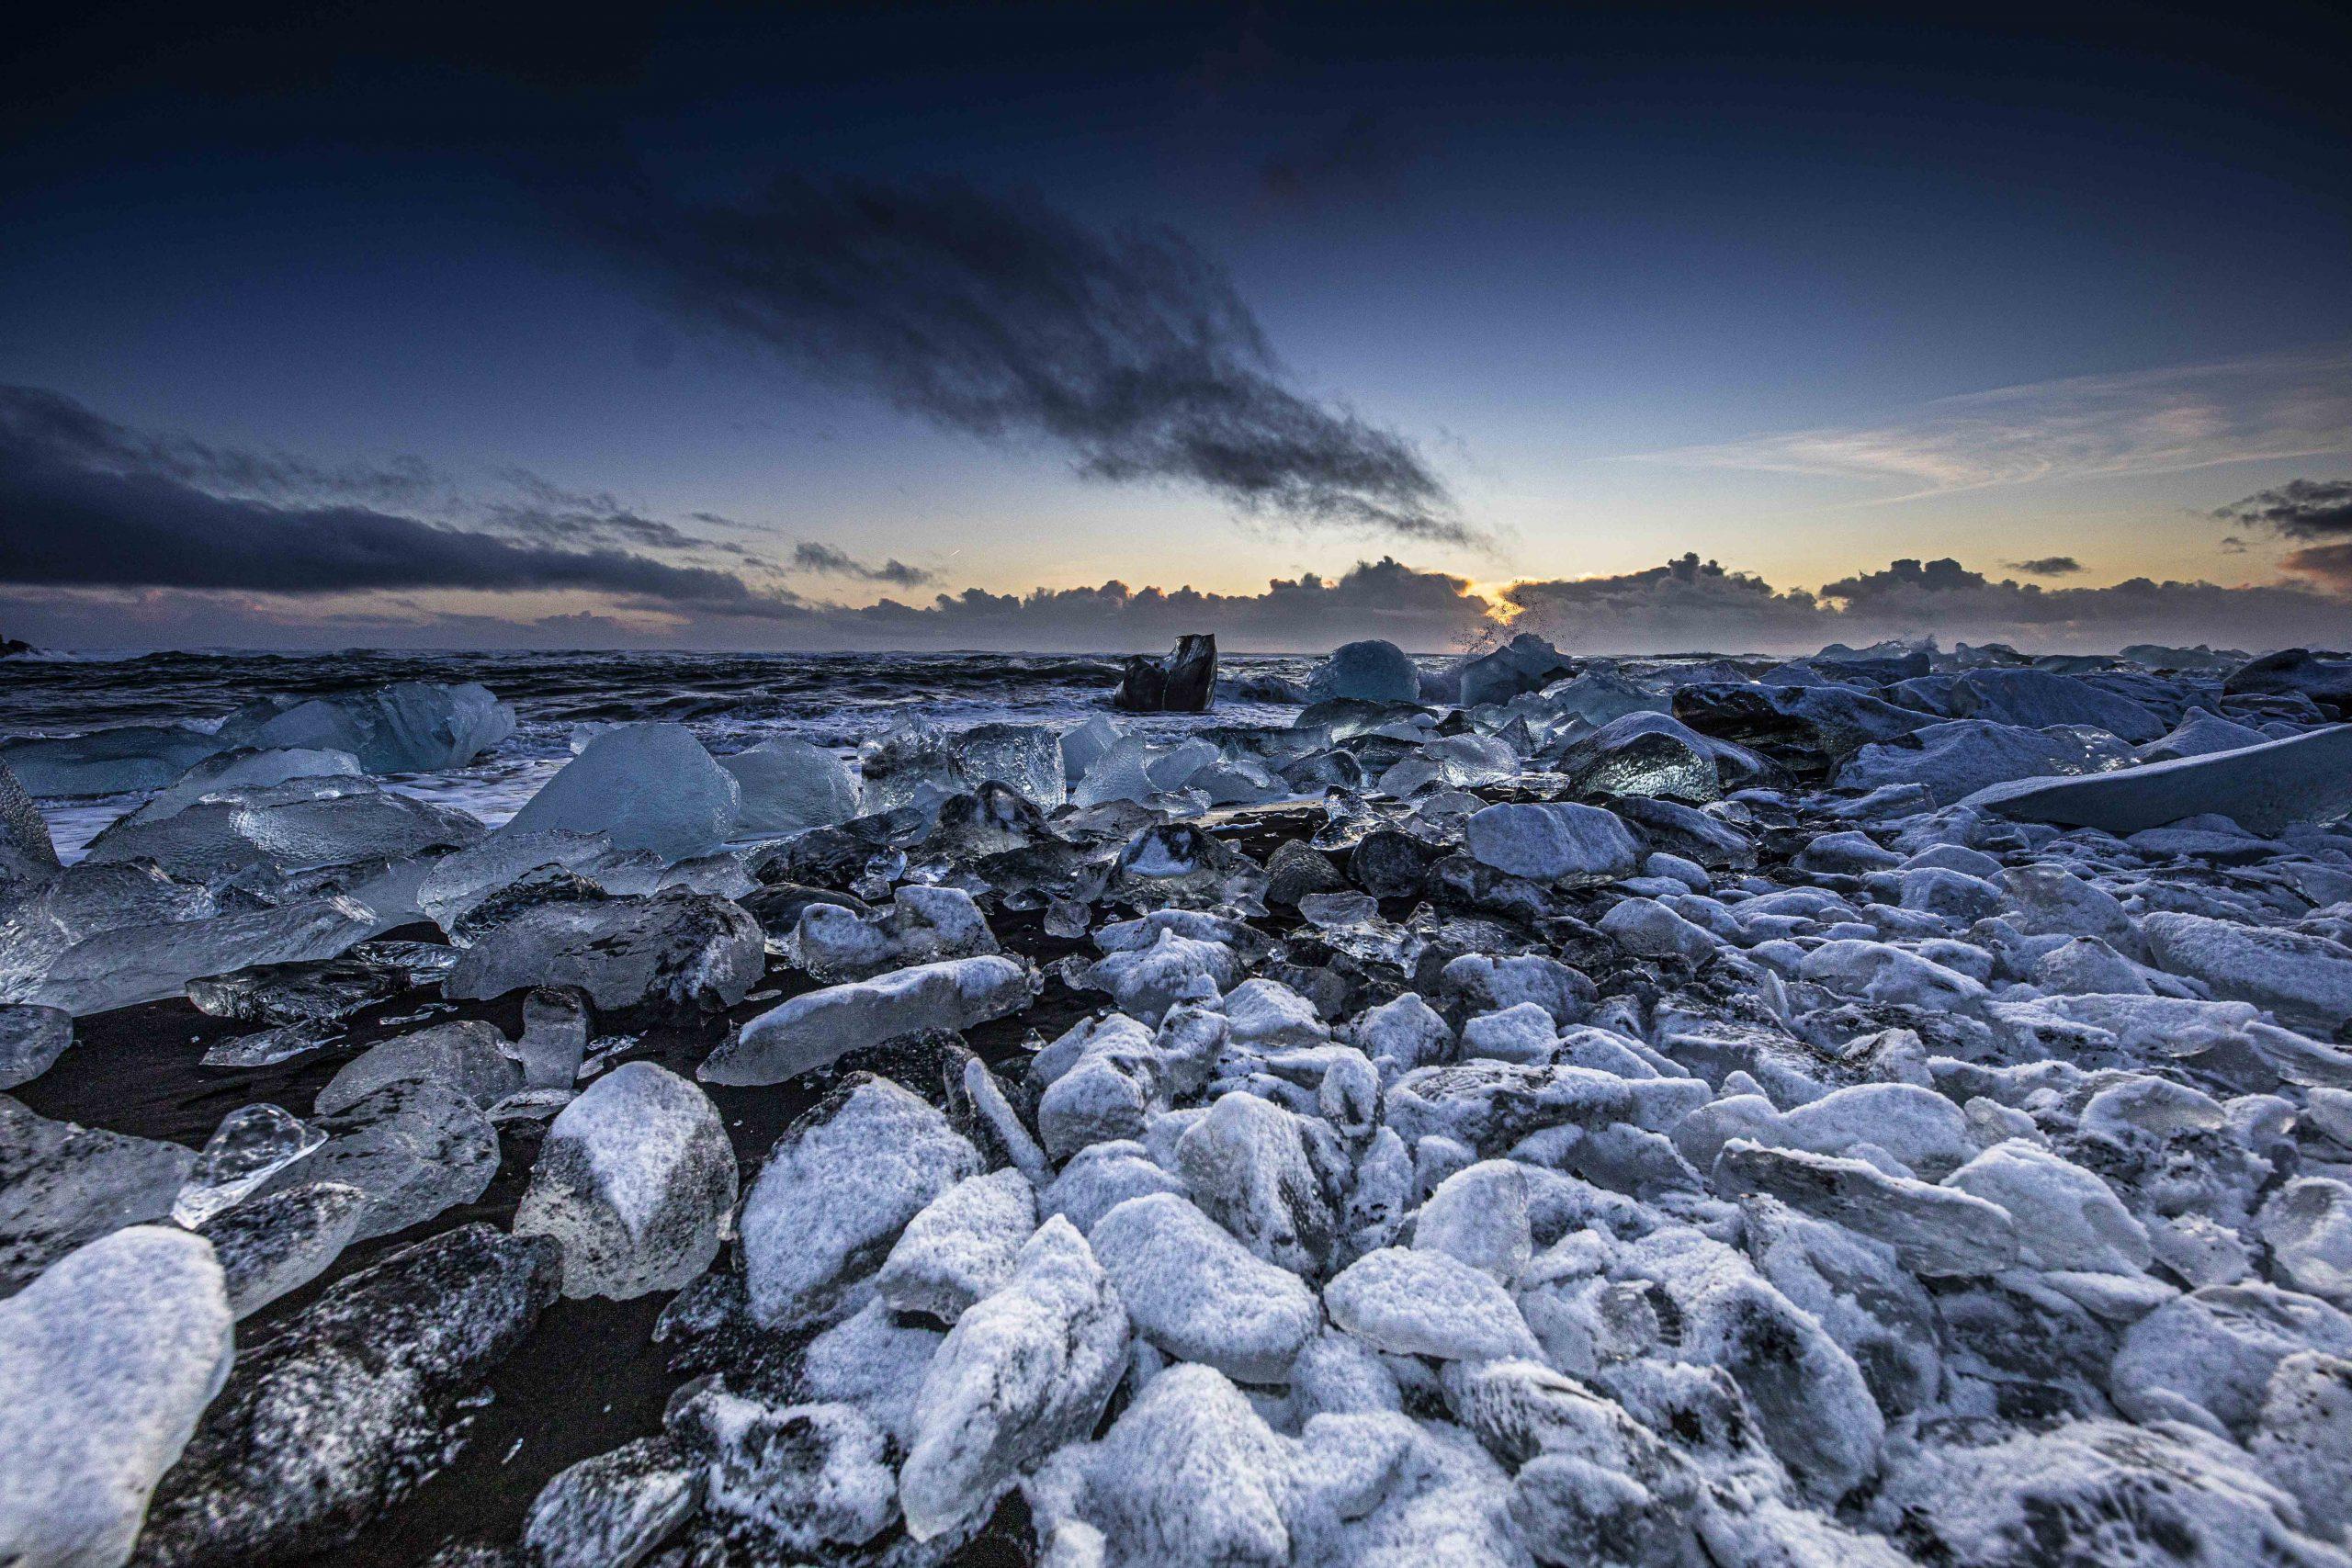 76-20-ICELAND-JAN-16jan20_0522-16677